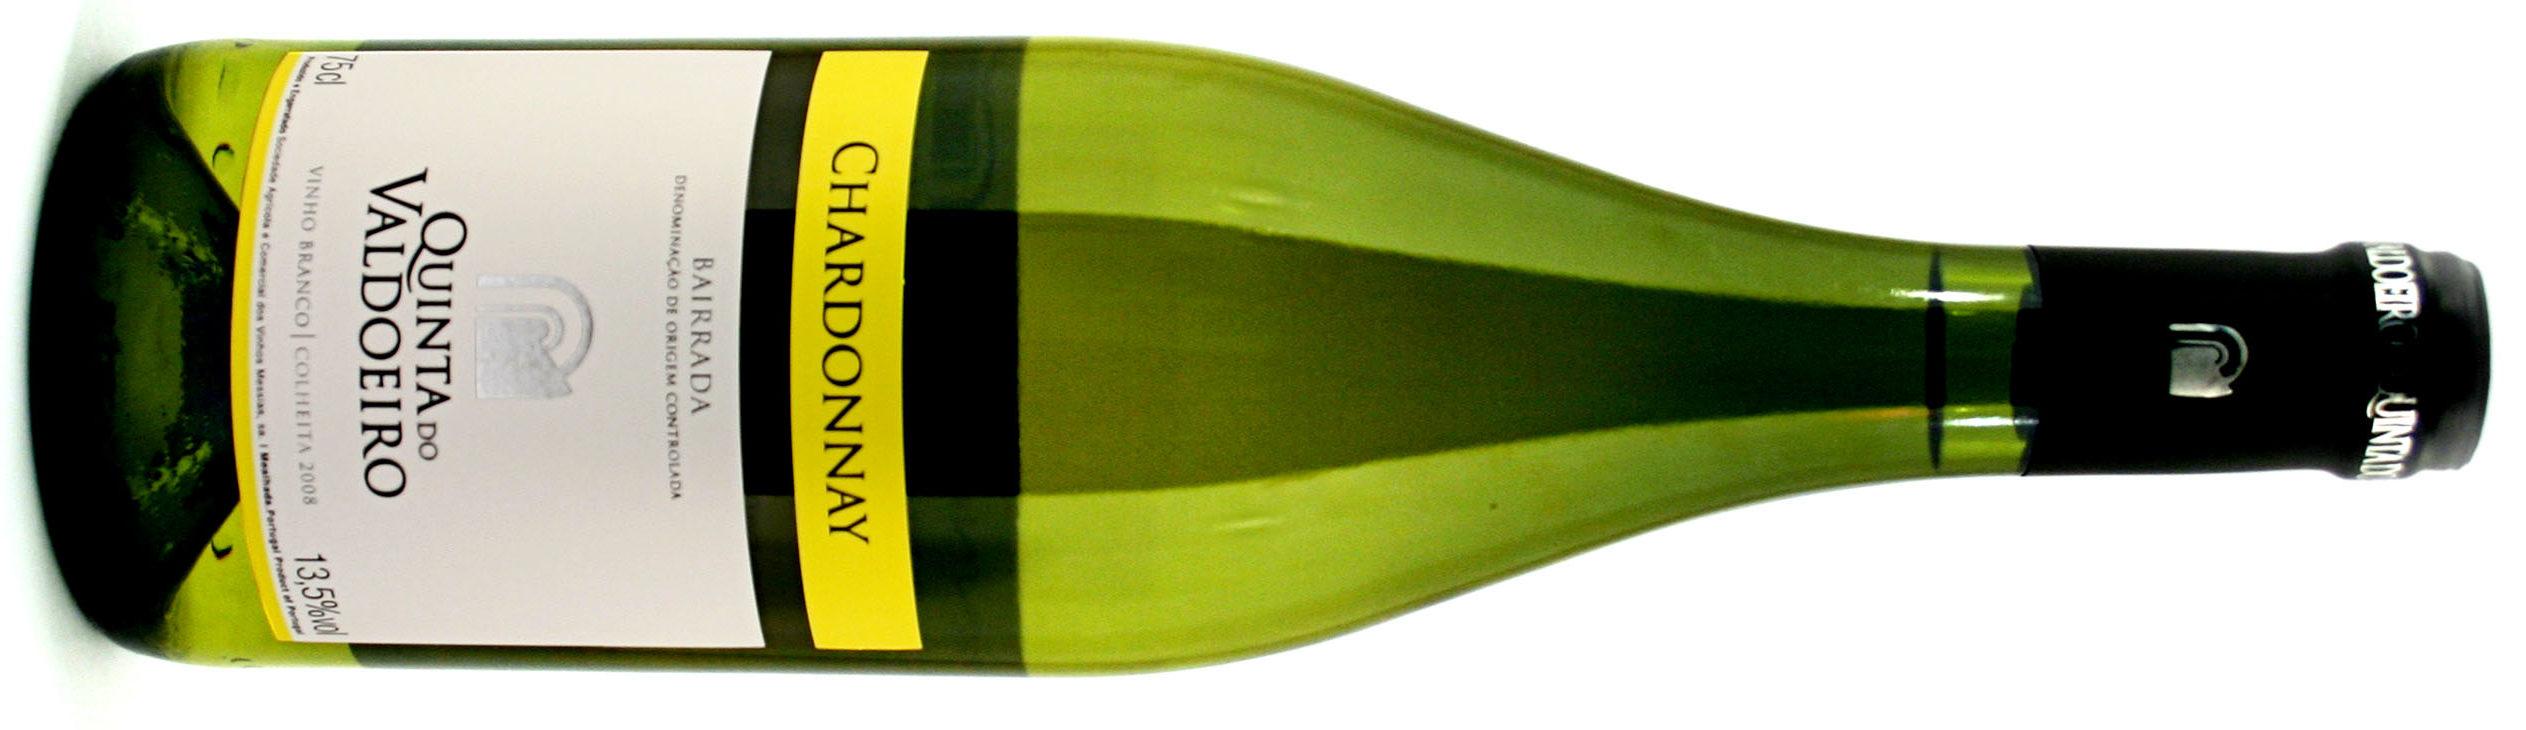 quinta-do-valdoeiro-chardonnay